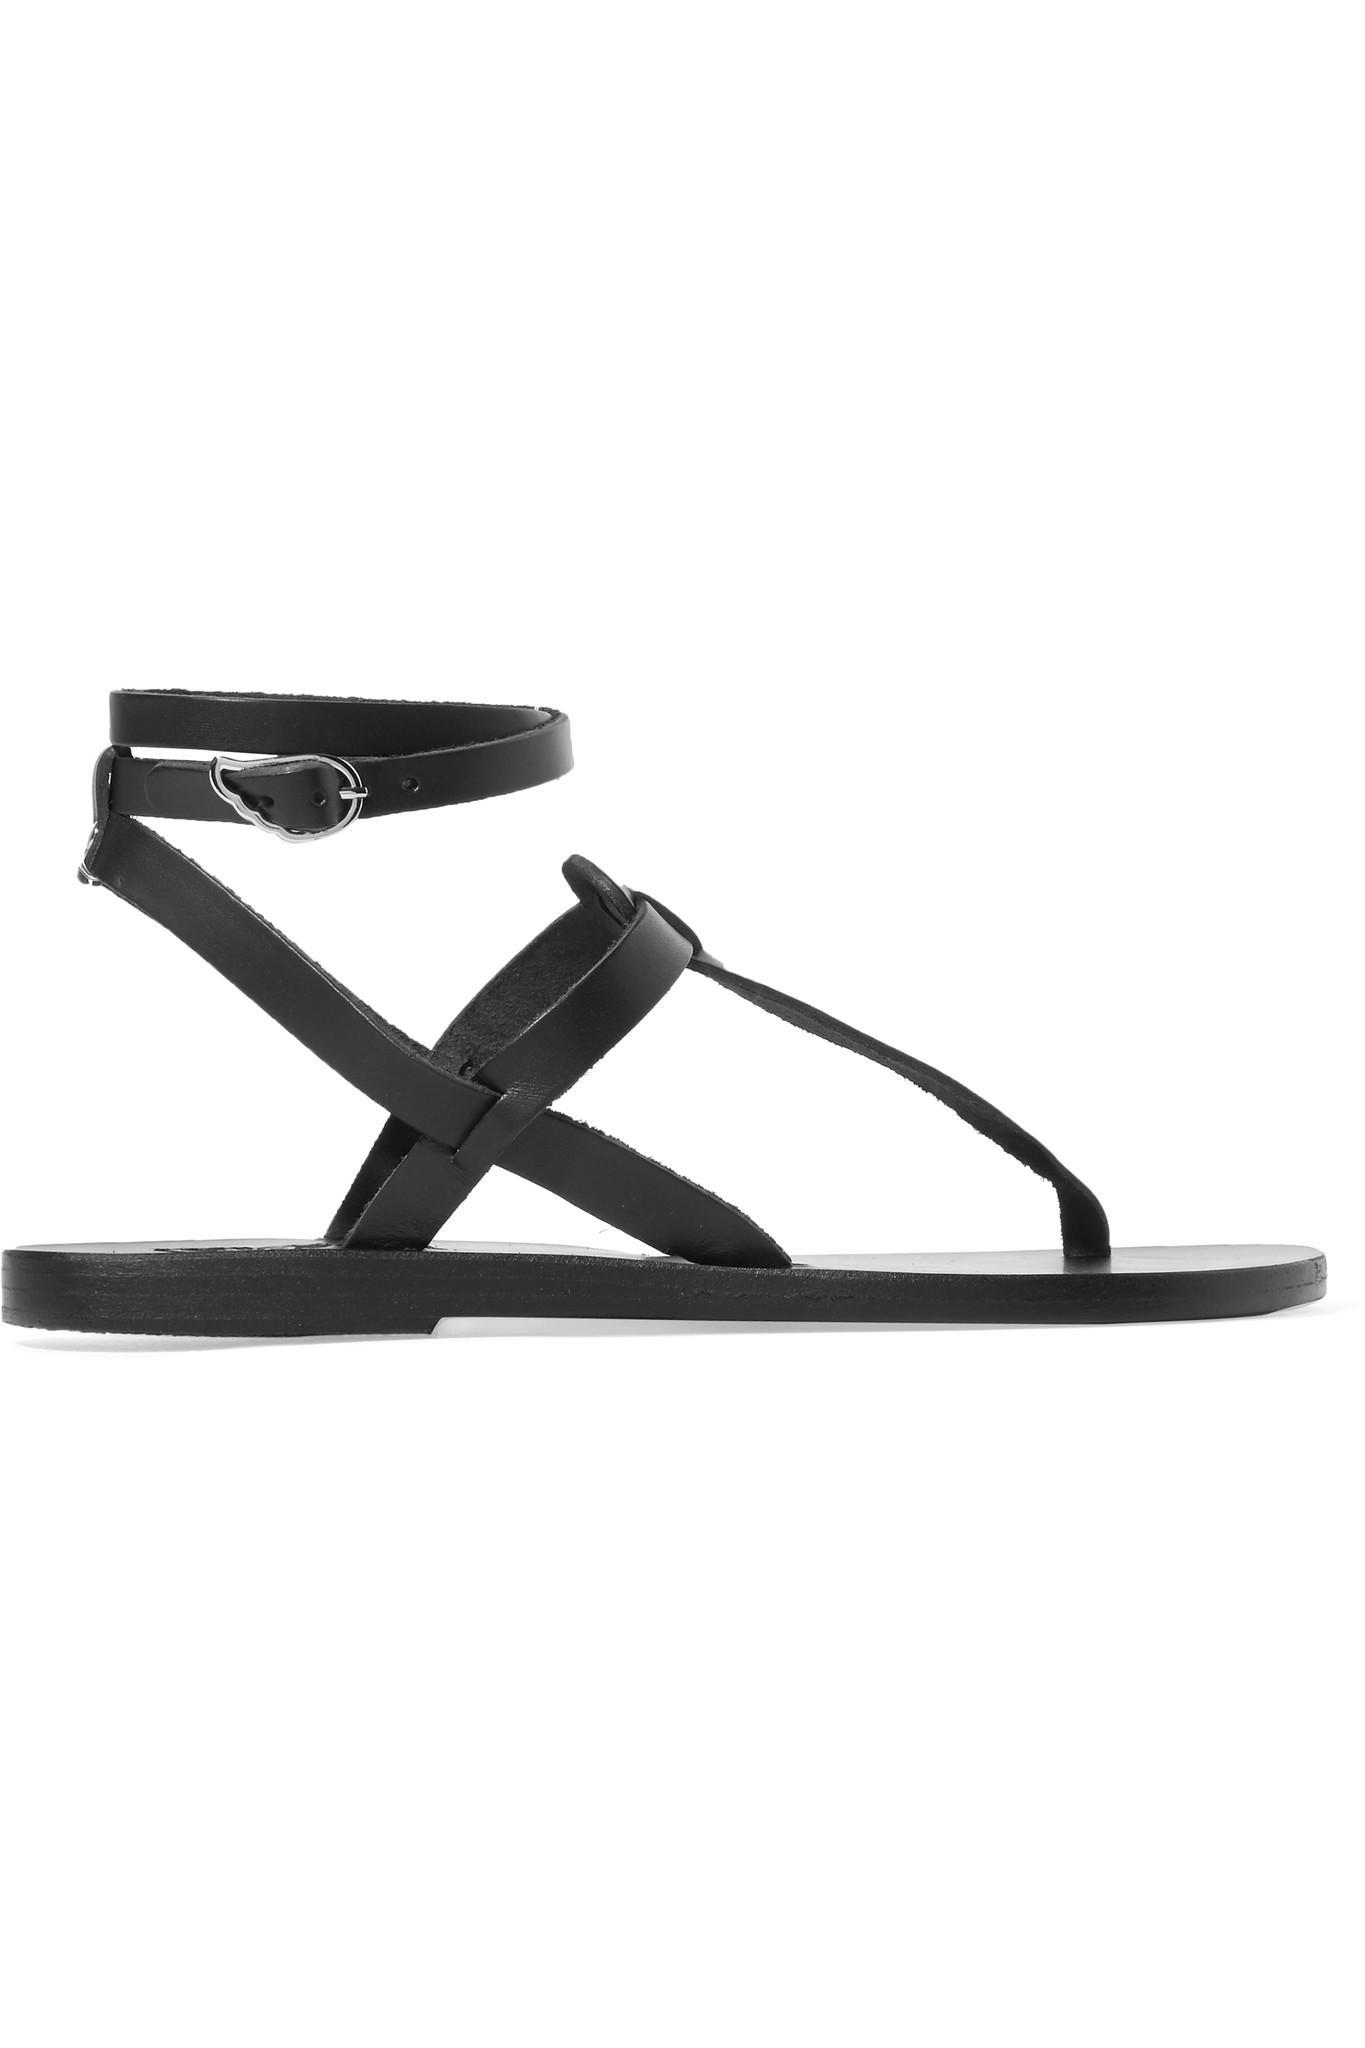 2d7abc80b2d5f4 Lyst - Ancient Greek Sandals Estia Leather Sandals in Black